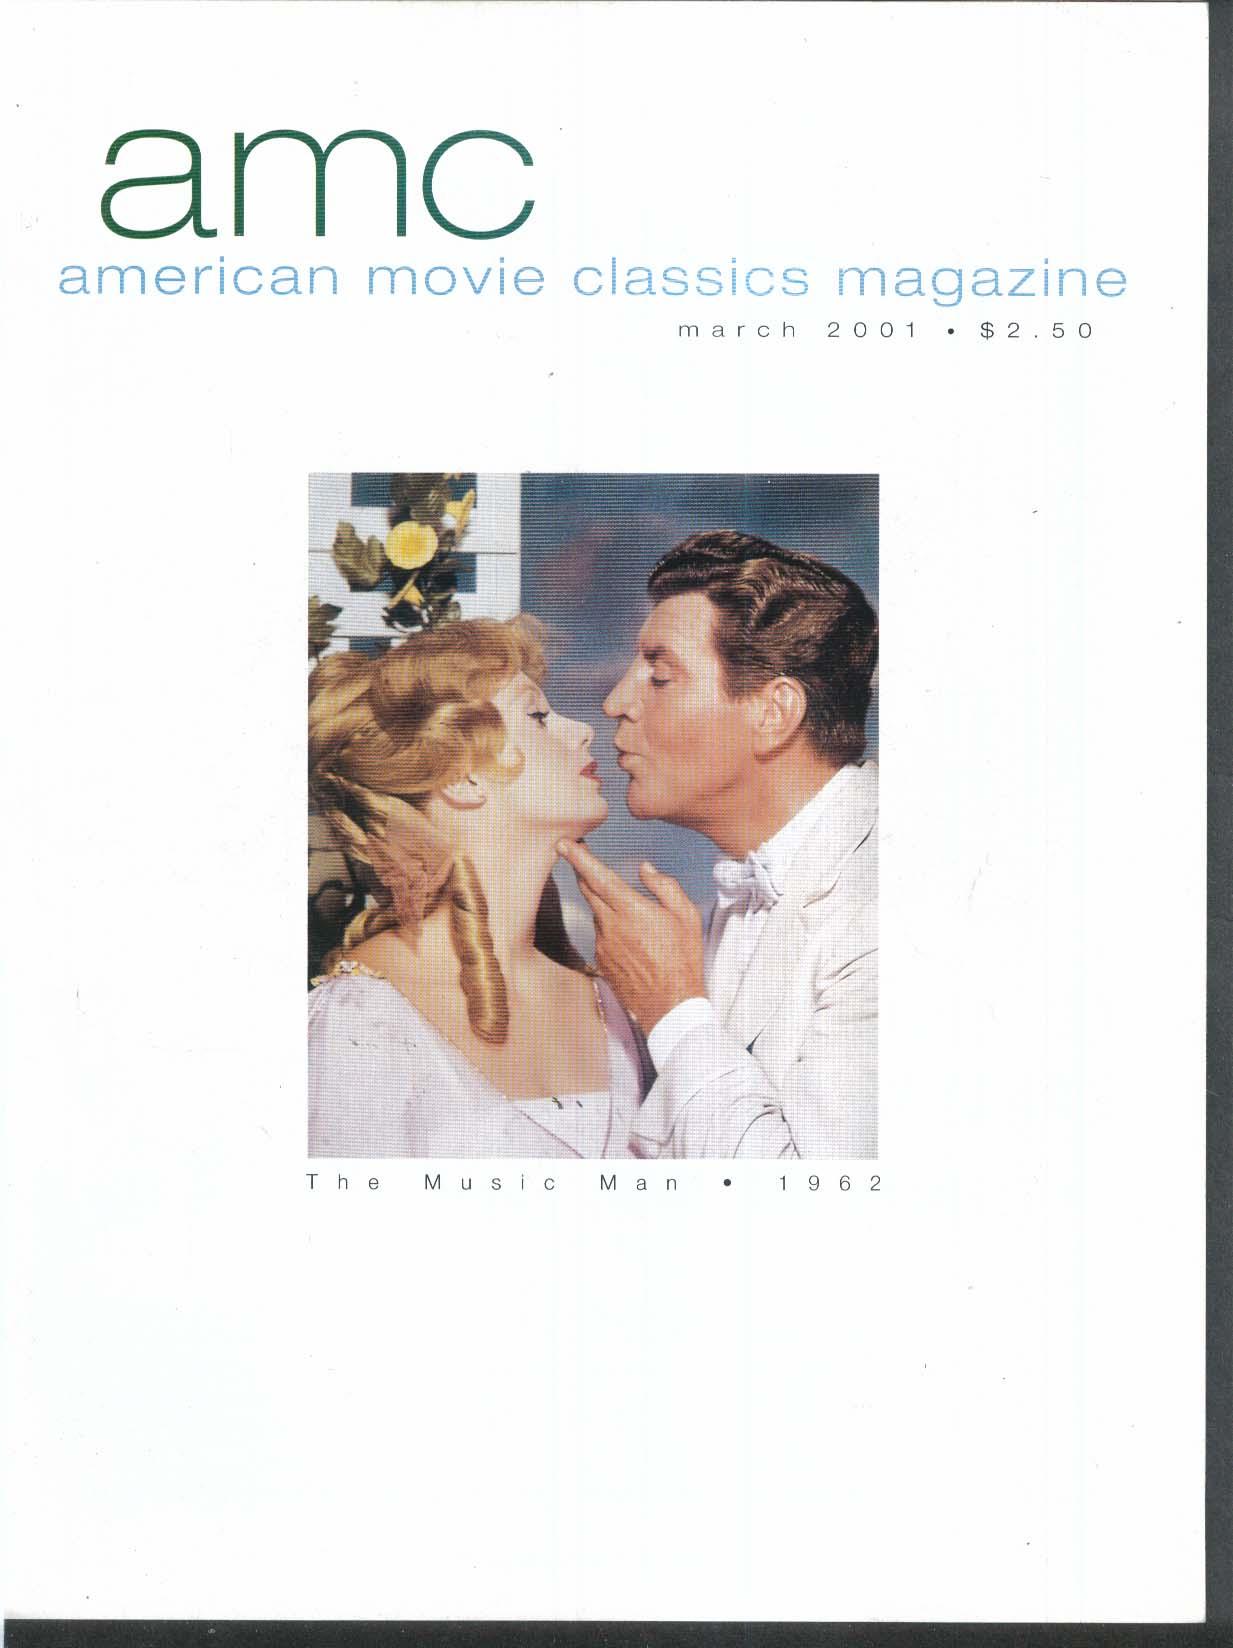 AMC Music Man Jack Nicholson Picnic The Two Jakes 3 2001